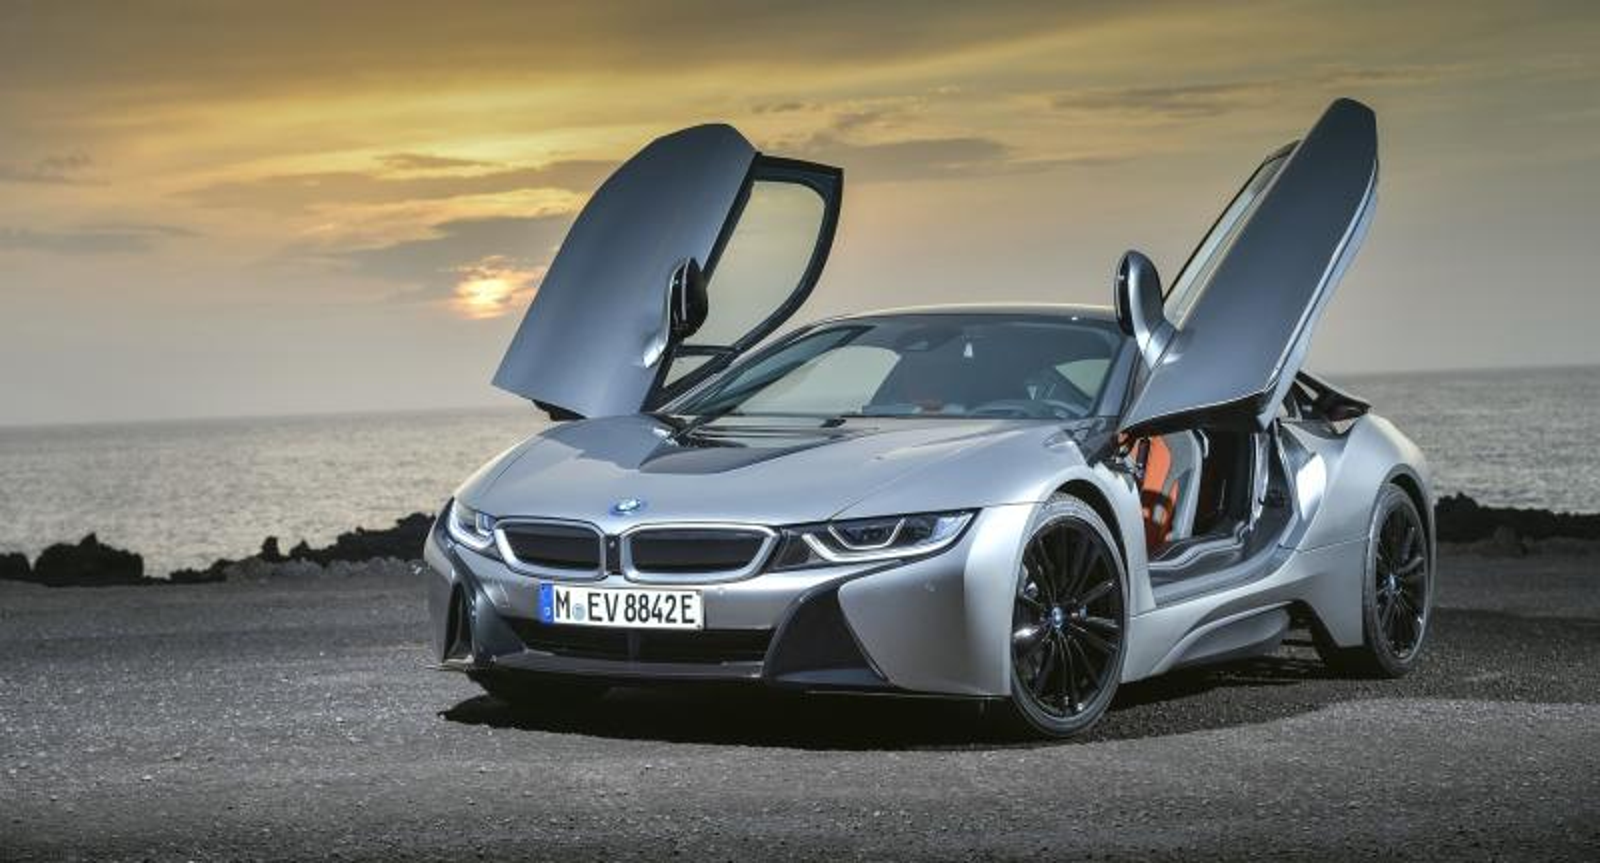 BMW-super fura - niemiecka myśl motorozacyjna (10×10)